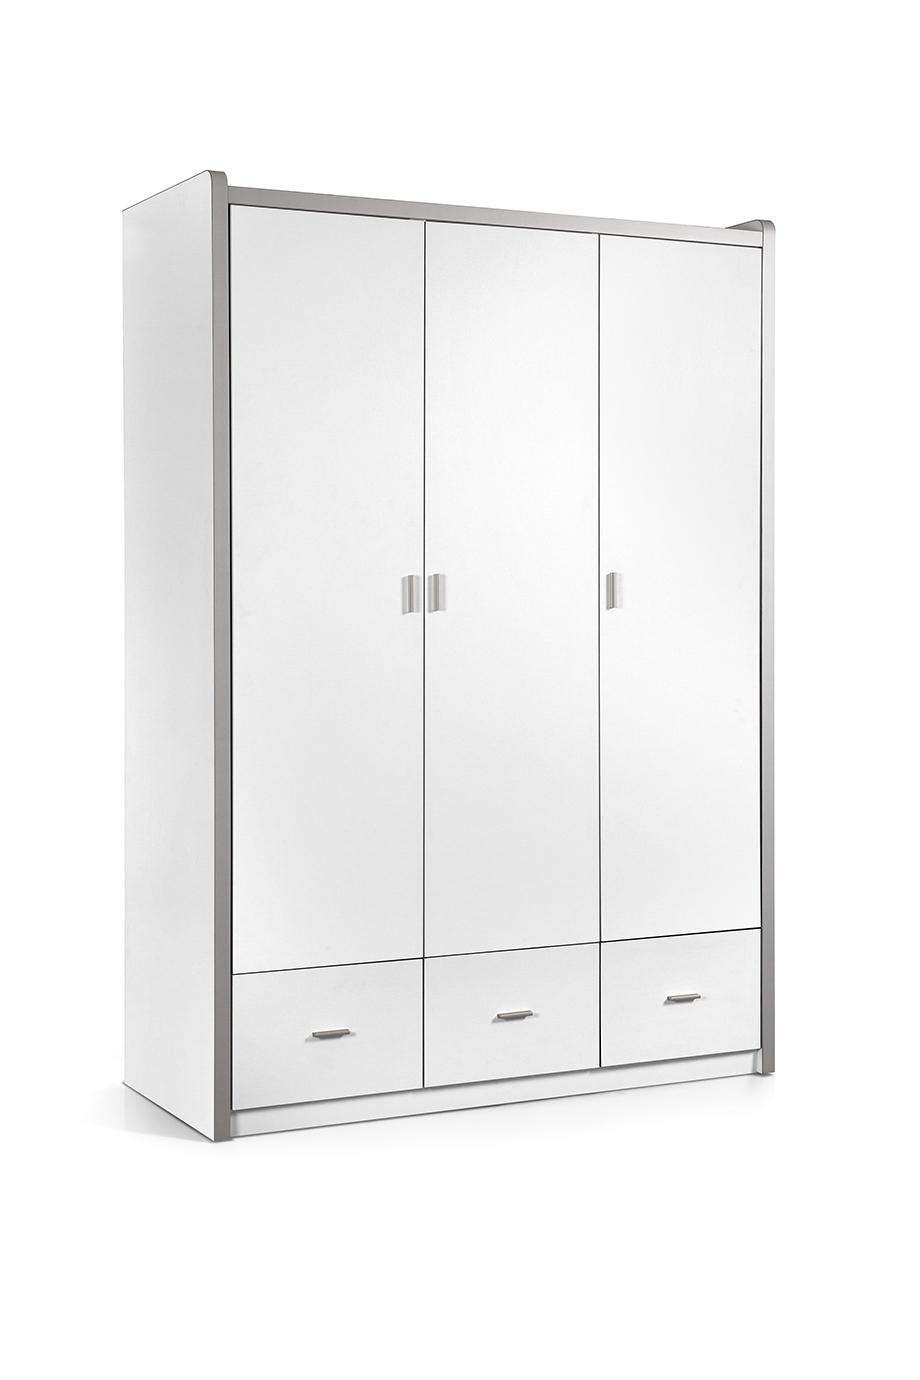 Dulap din pal si metal cu 3 usi si 3 sertare, pentru copii Bonny Alb, l140,5xA59xH202 cm imagine